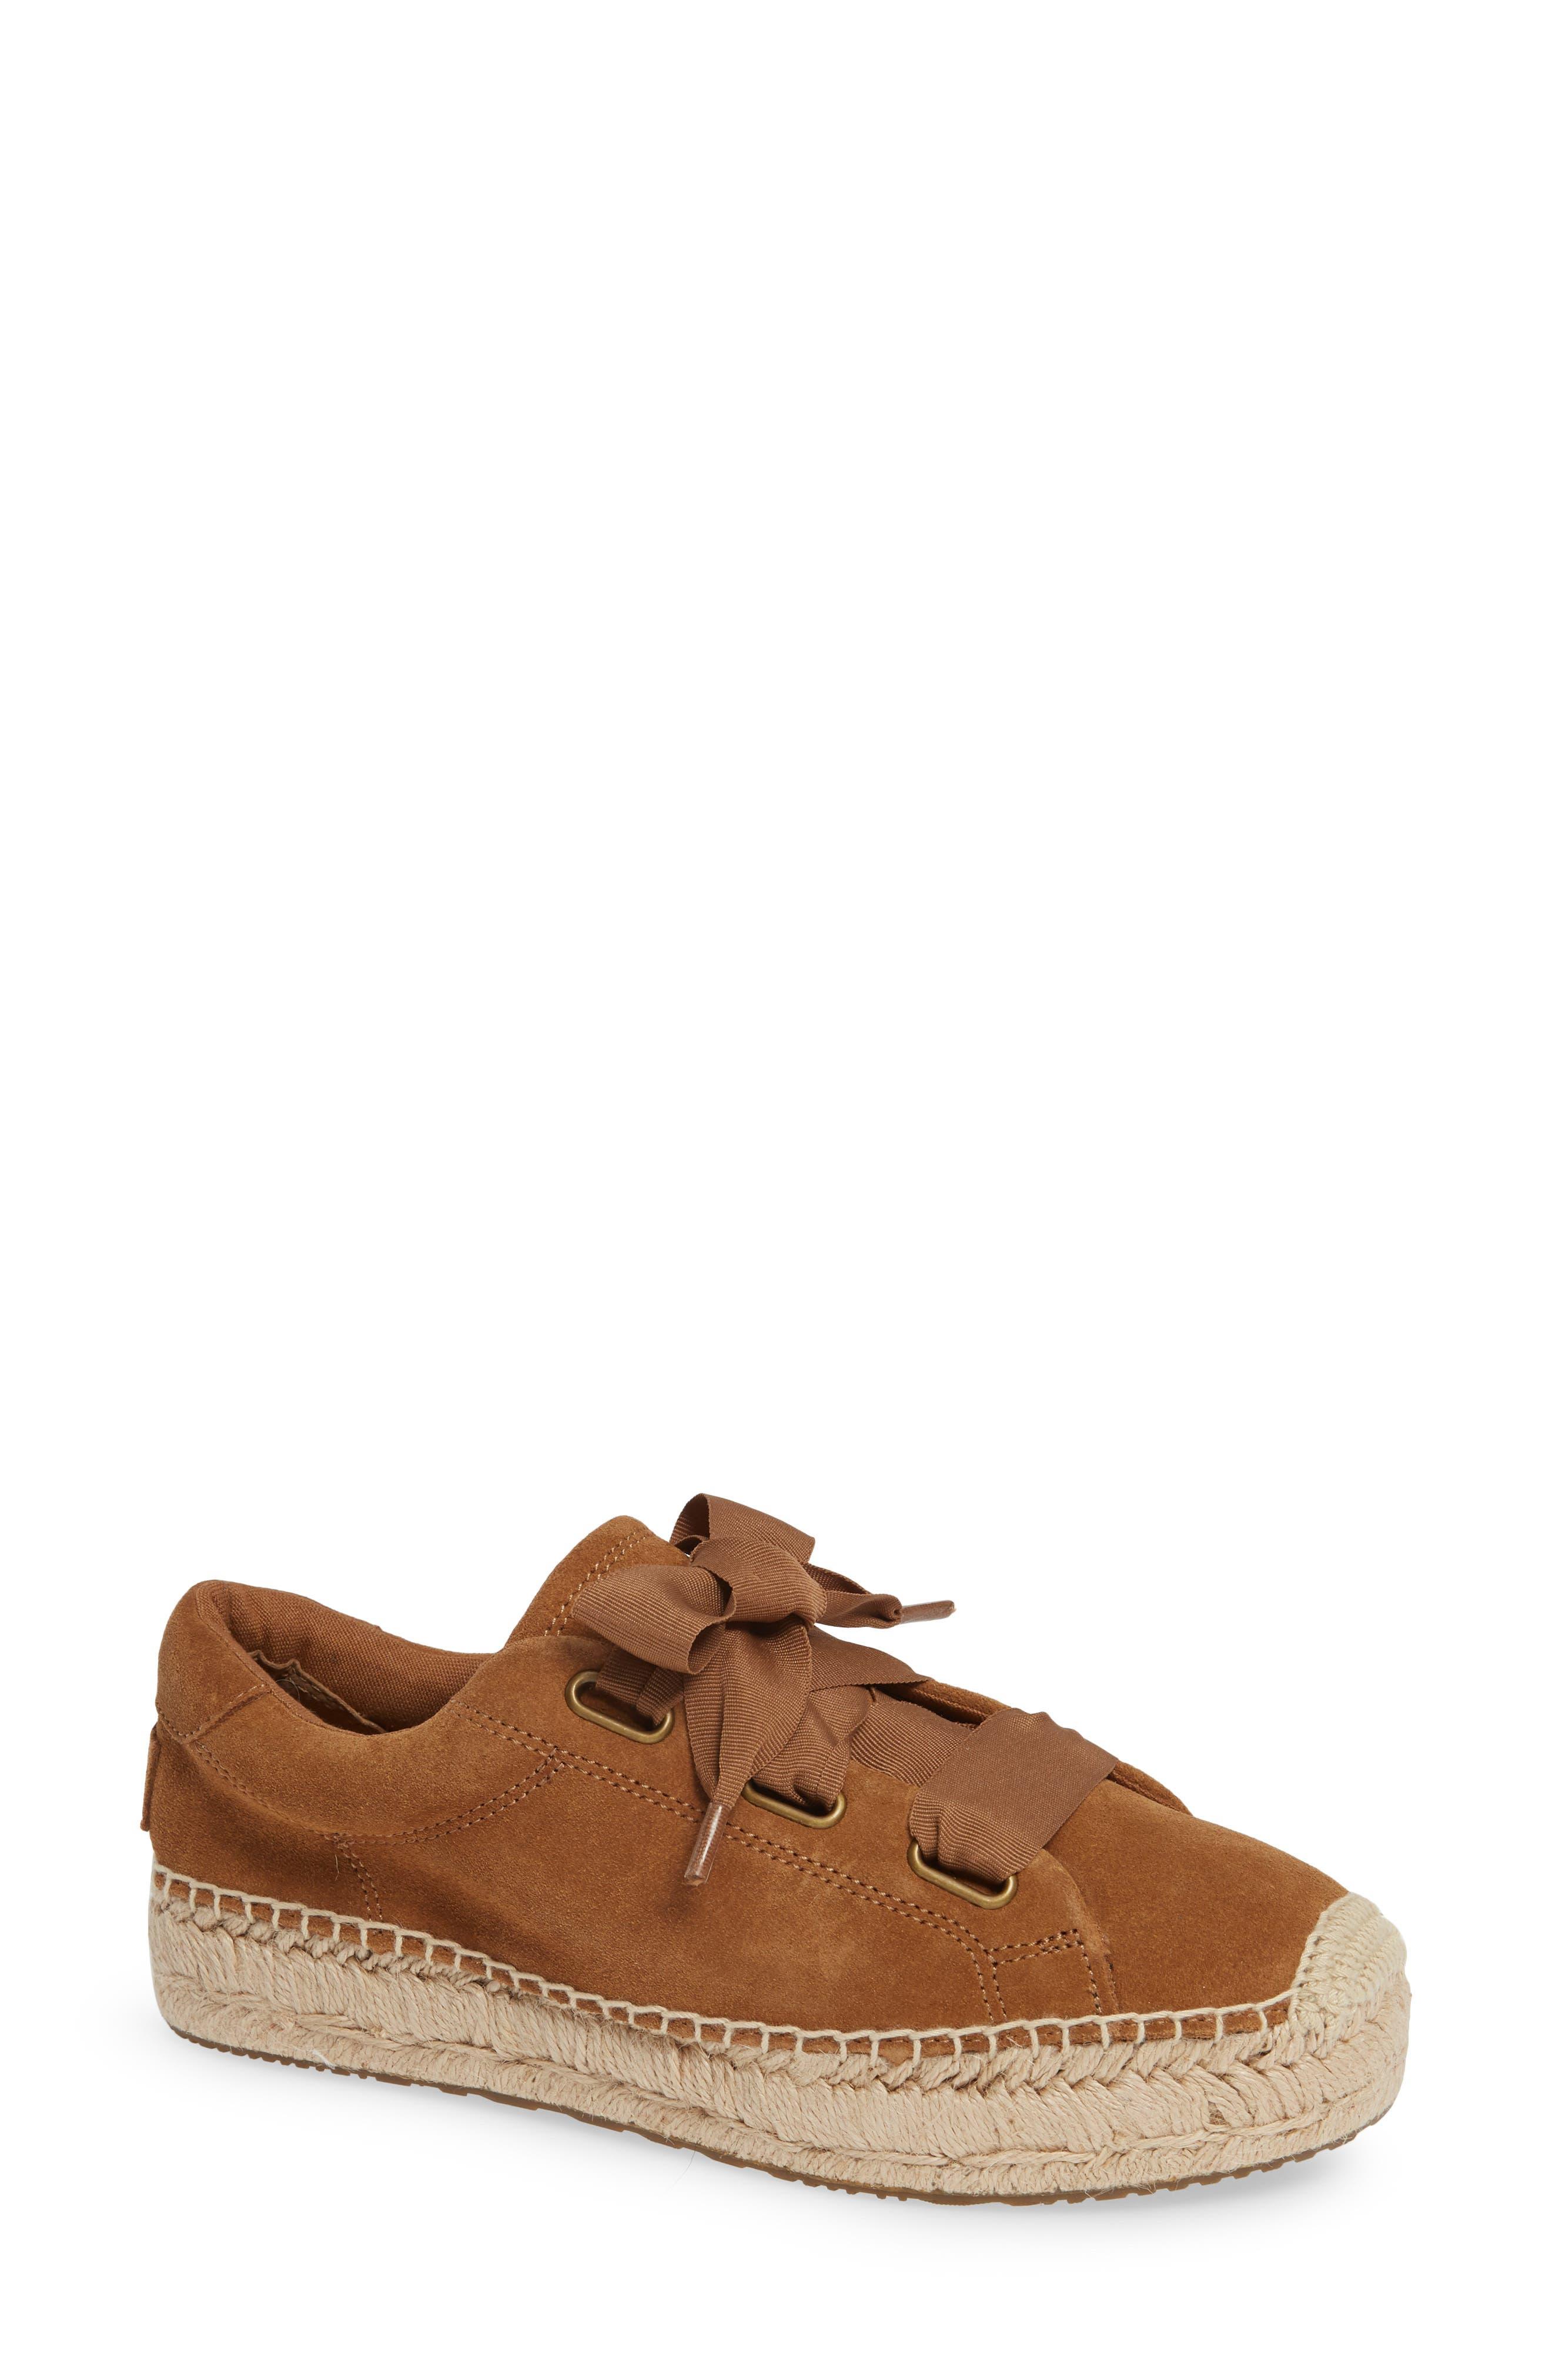 Running Ugg® Ugg® Women's ShoesNordstrom Sneakersamp; Women's Sneakersamp; 4A5RjL